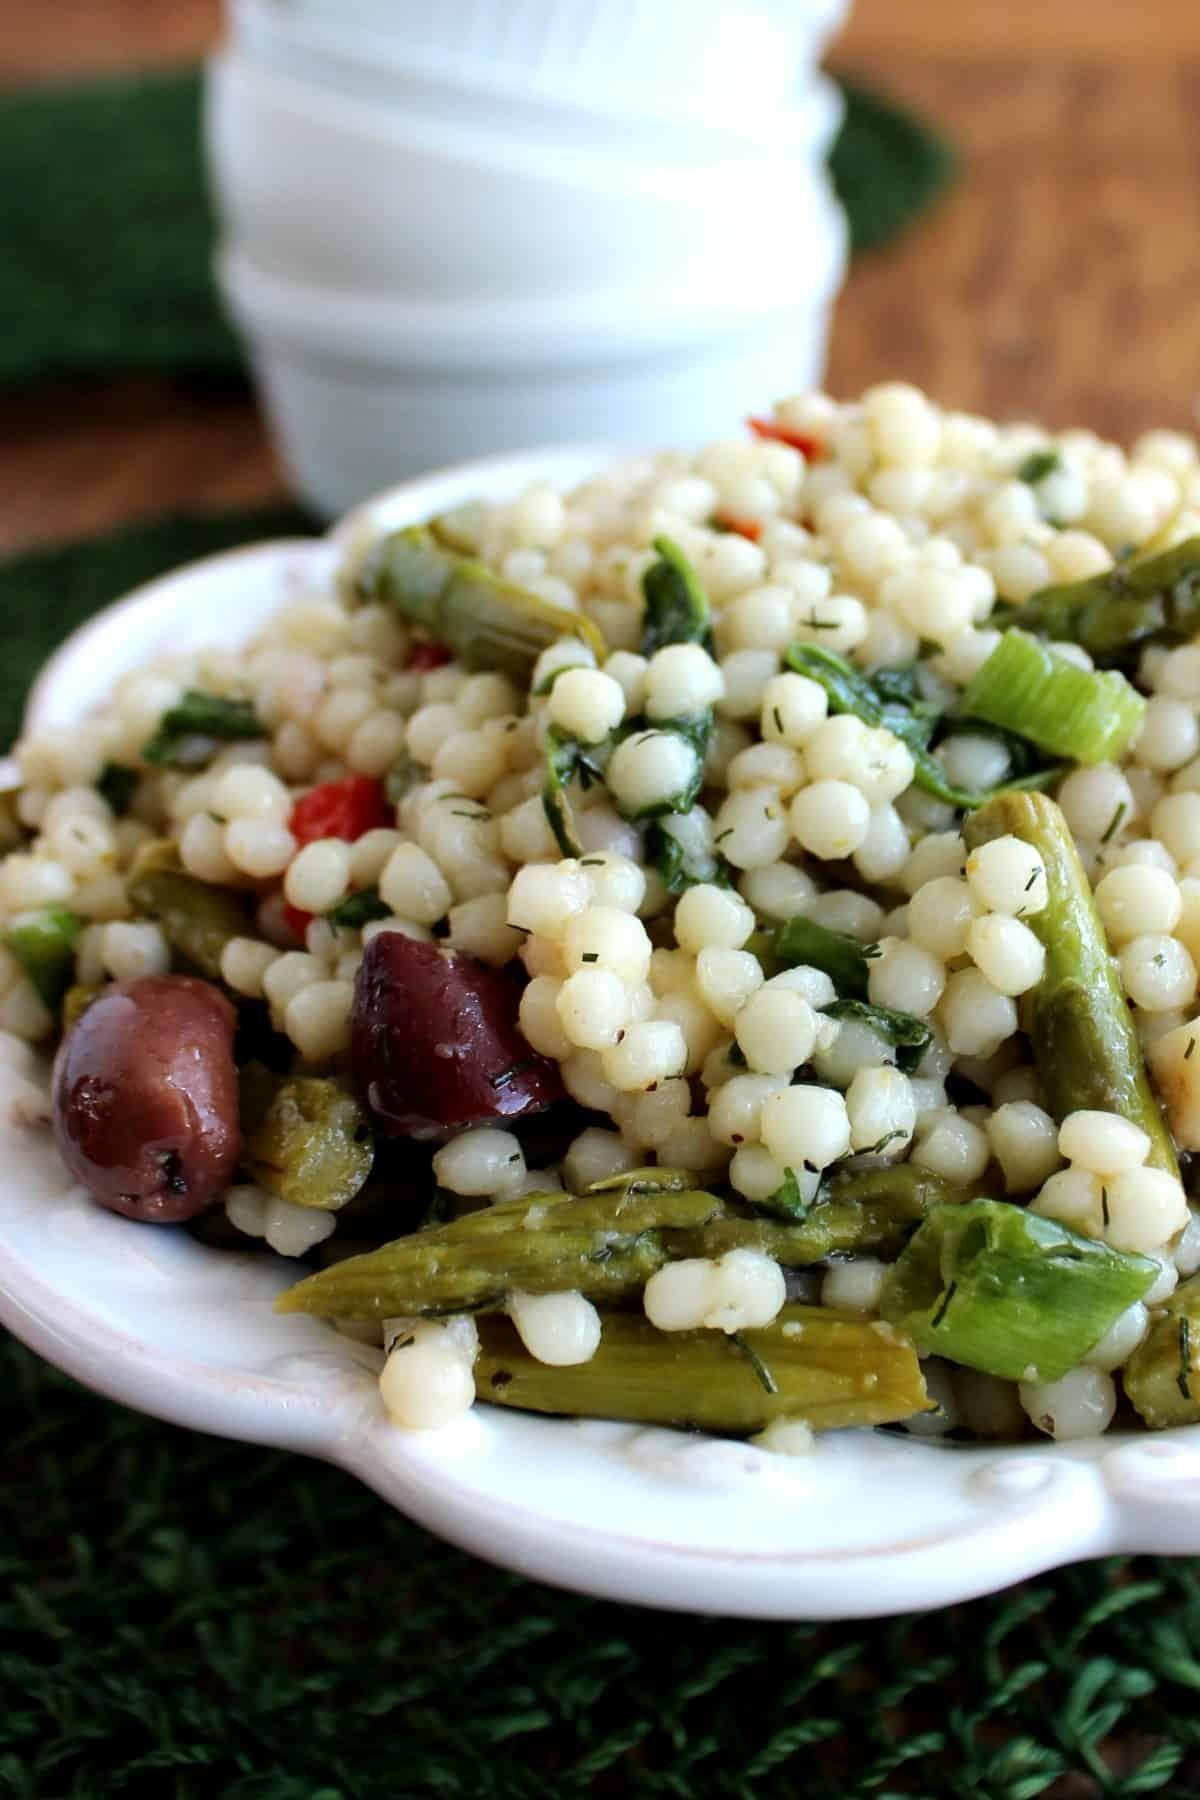 Israeli Pearl Couscous Salad Has An Array Of Veggies Including Asparagus And Olives A Delicious Lunch And Th Couscous Salad Recipes Pearl Couscous Salad Salad